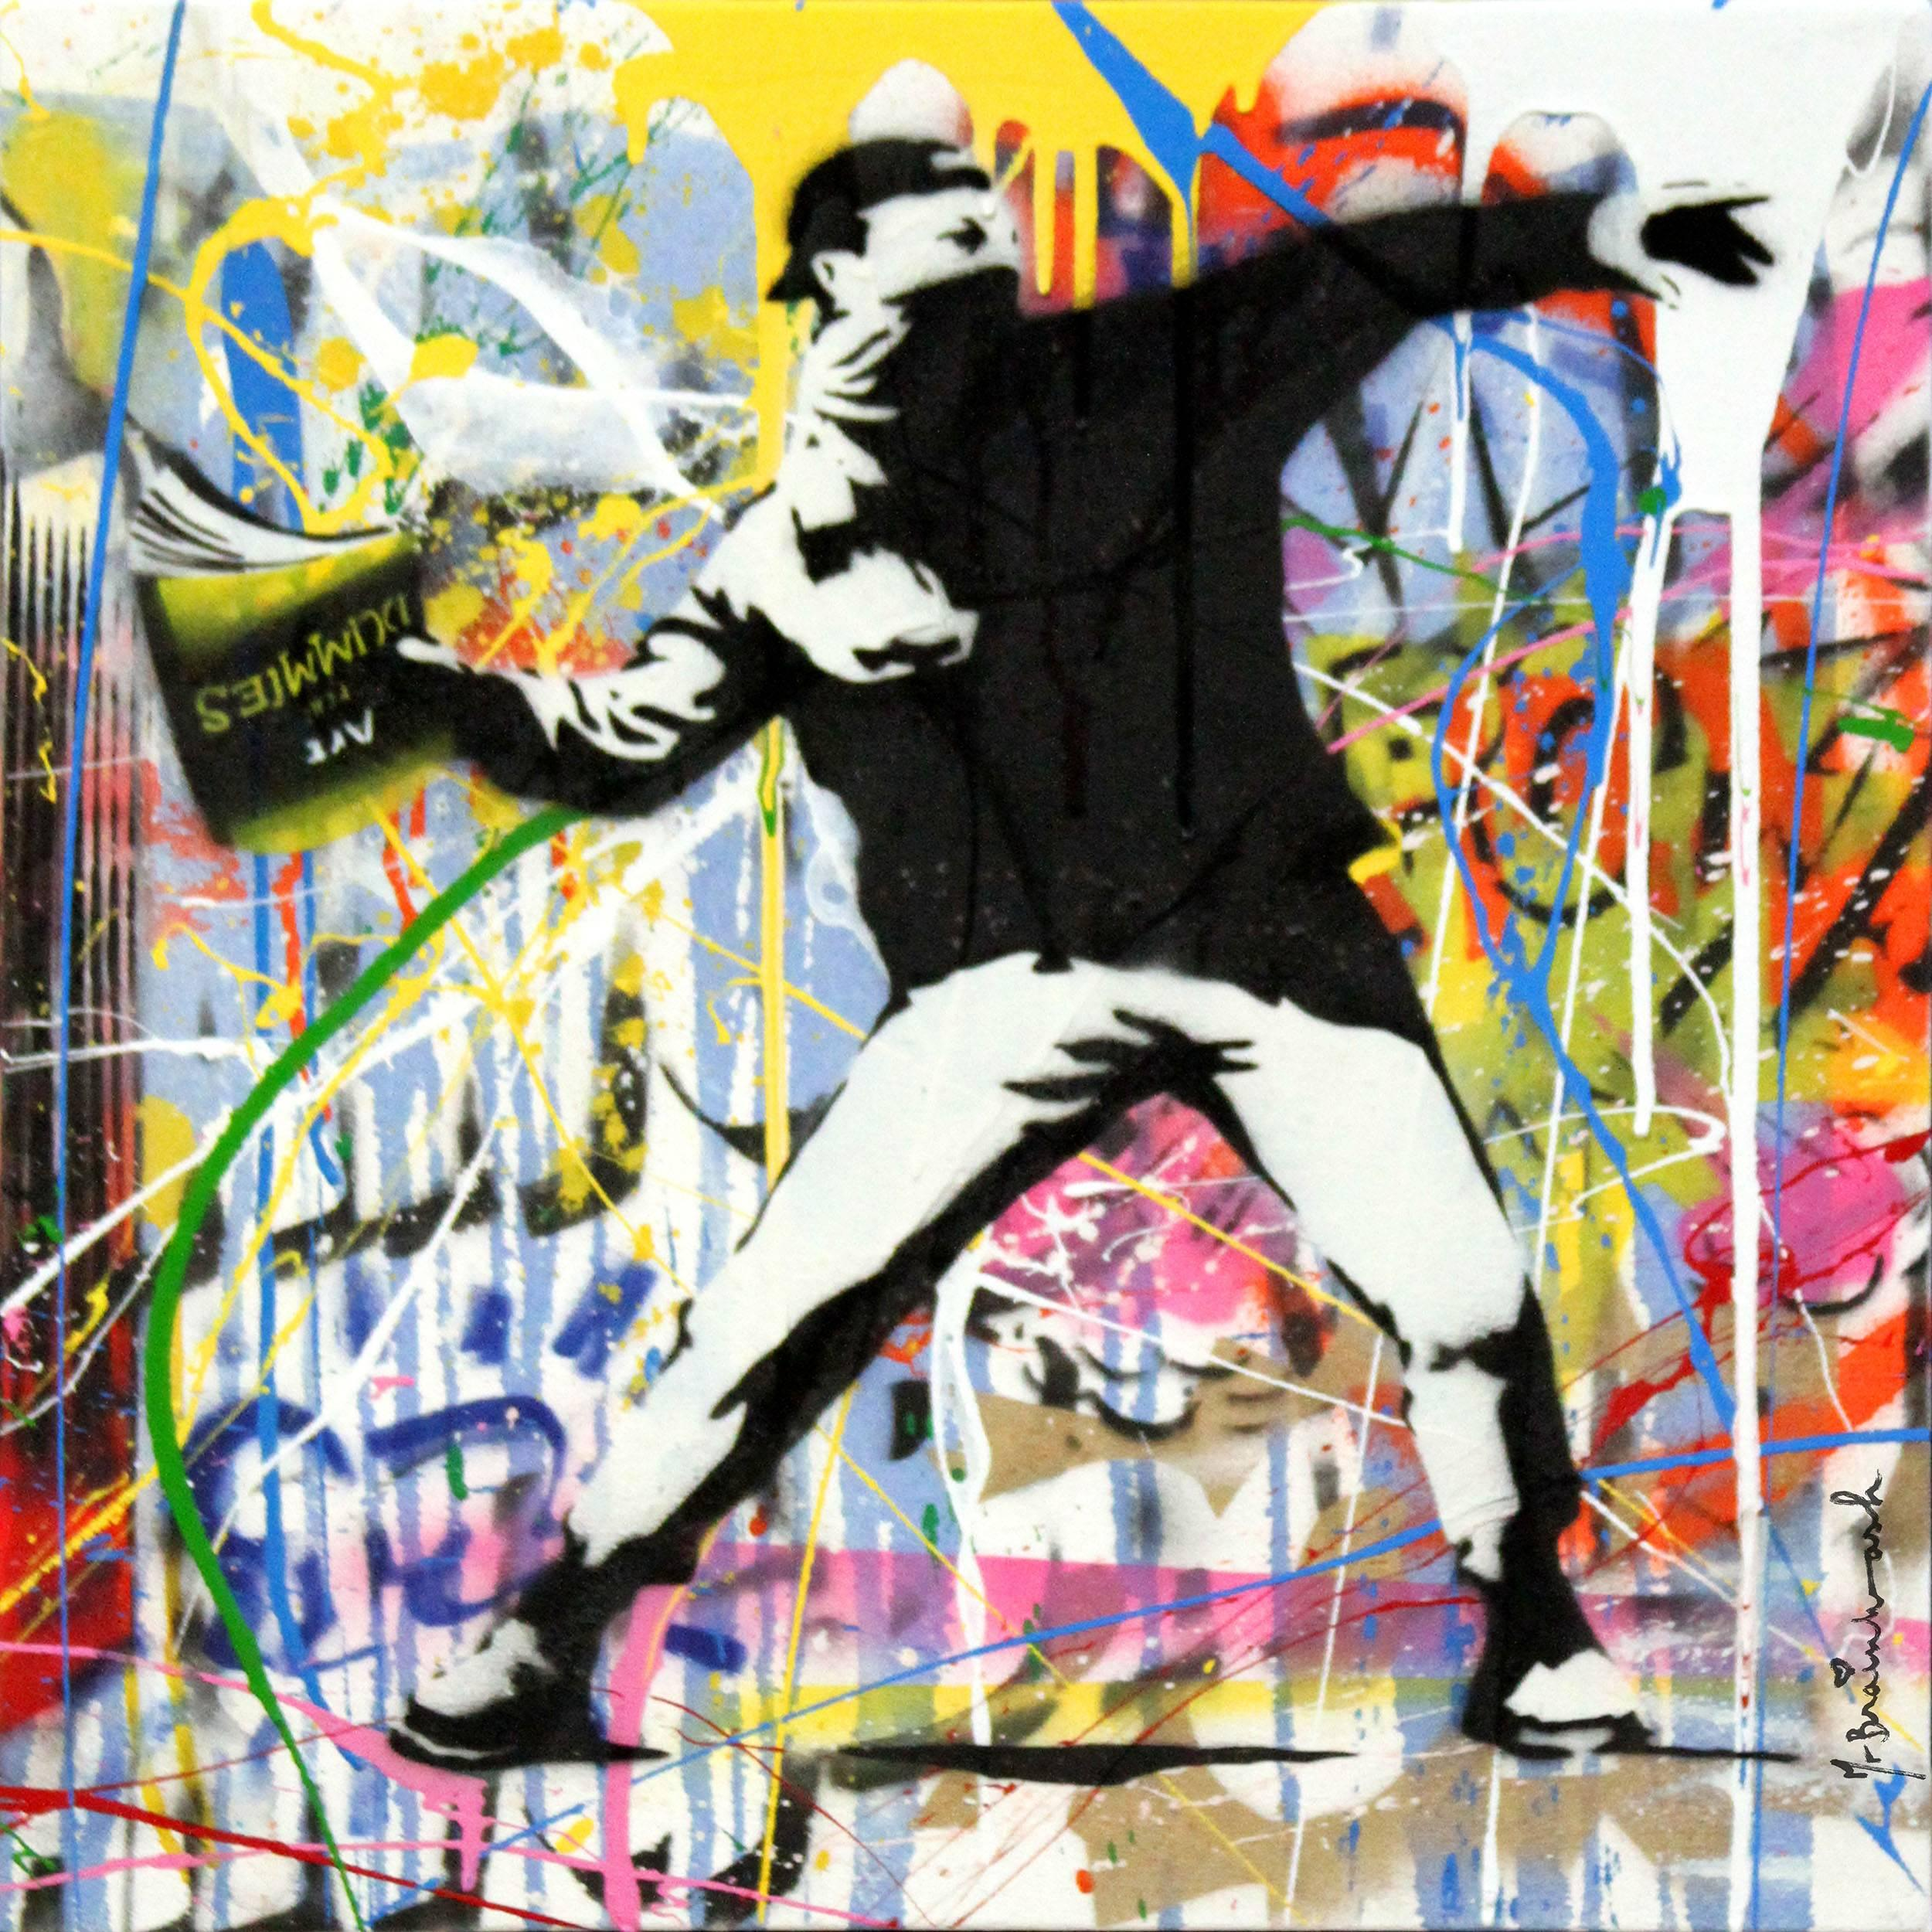 Banksy Thrower (18) by Mr. Brainwash